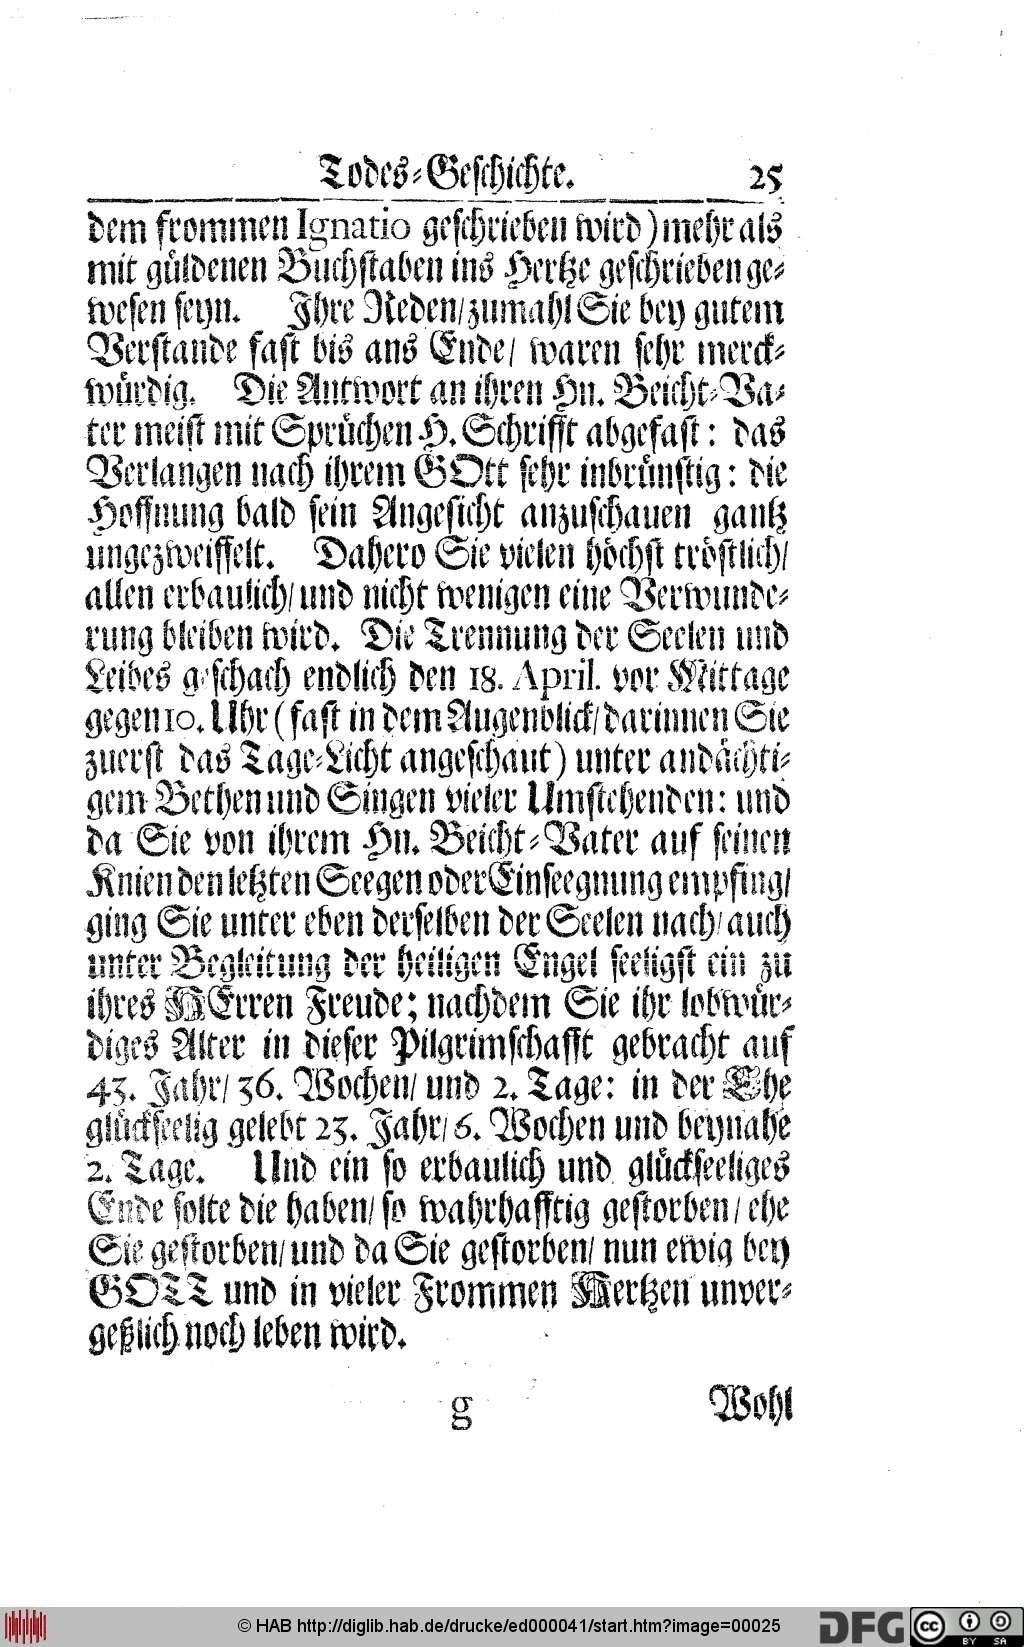 http://diglib.hab.de/drucke/ed000041/00025.jpg